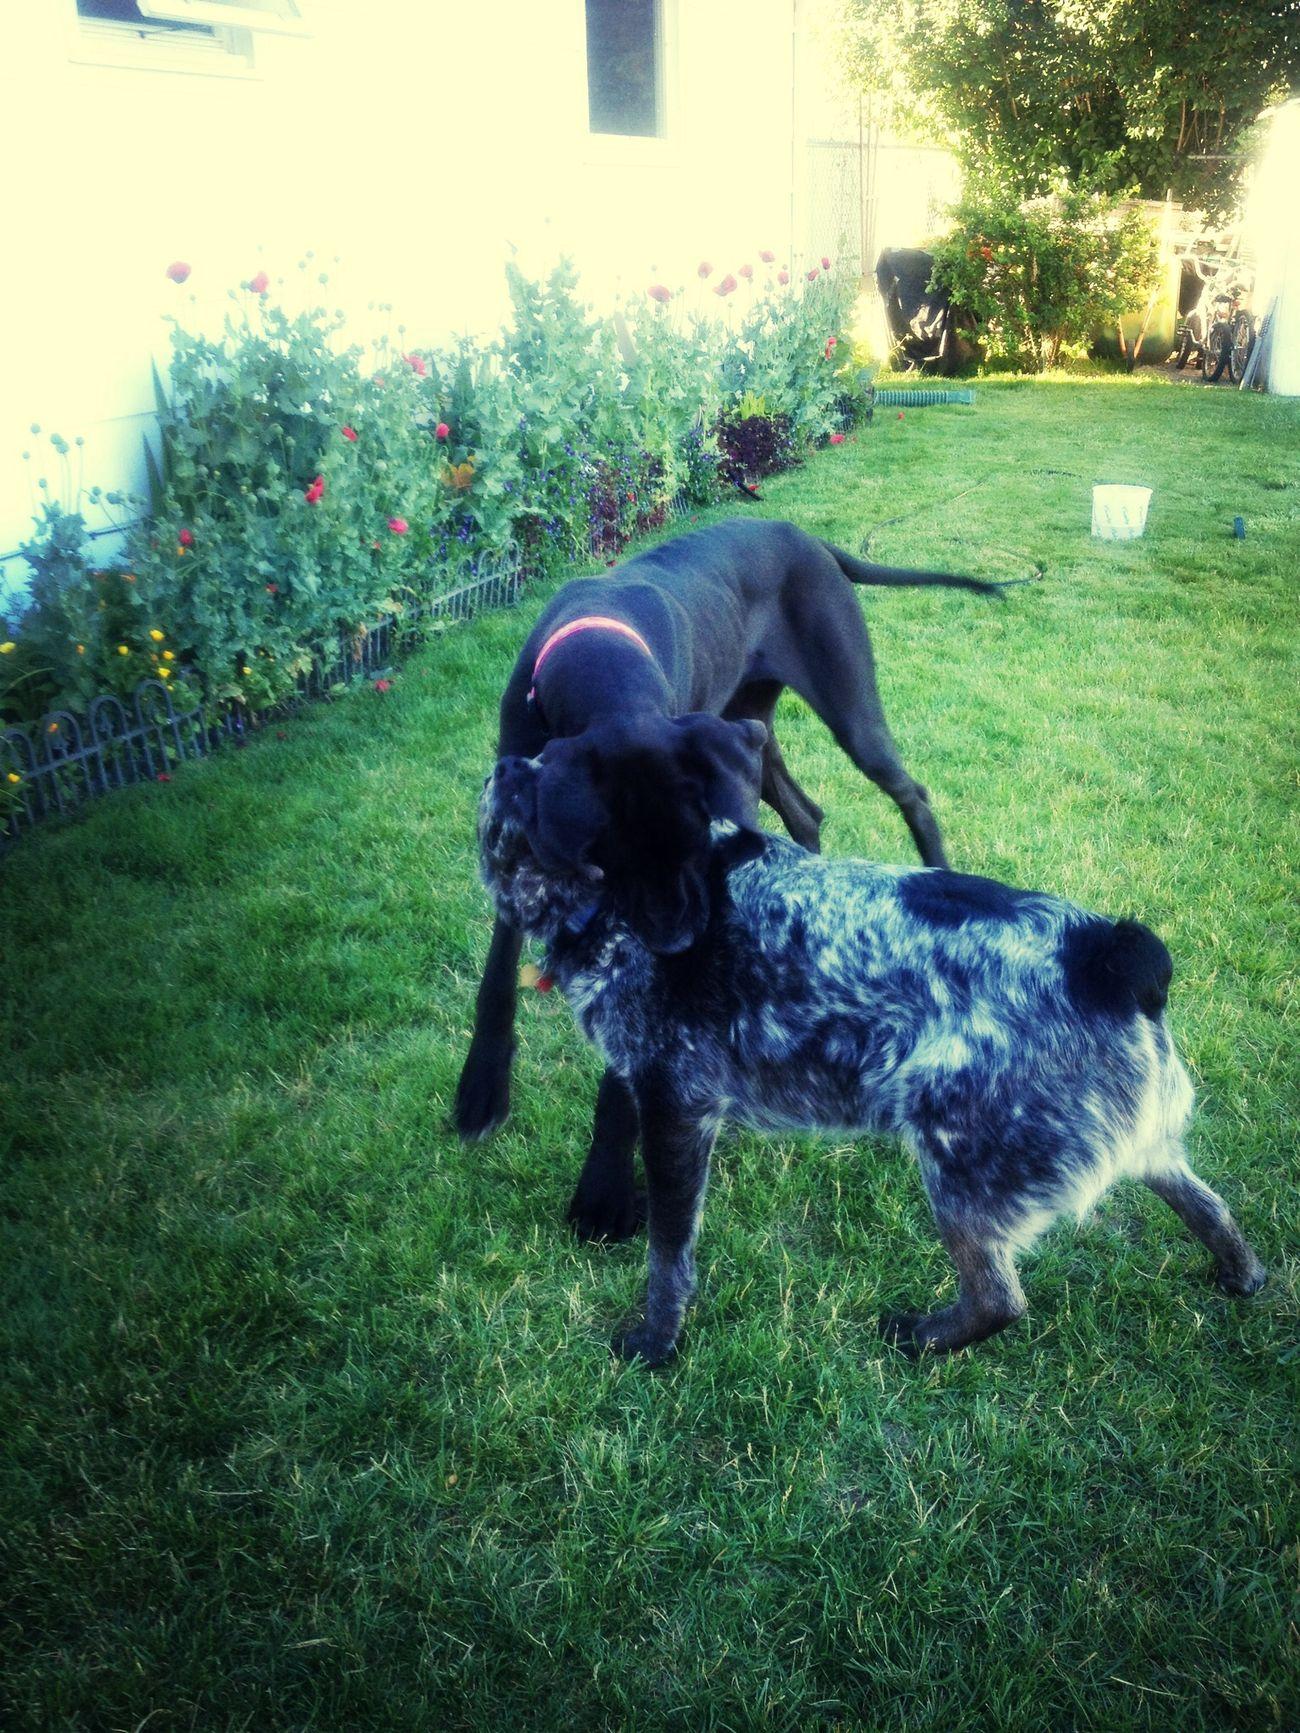 Dogs Great Dane Blue Heeler Playing